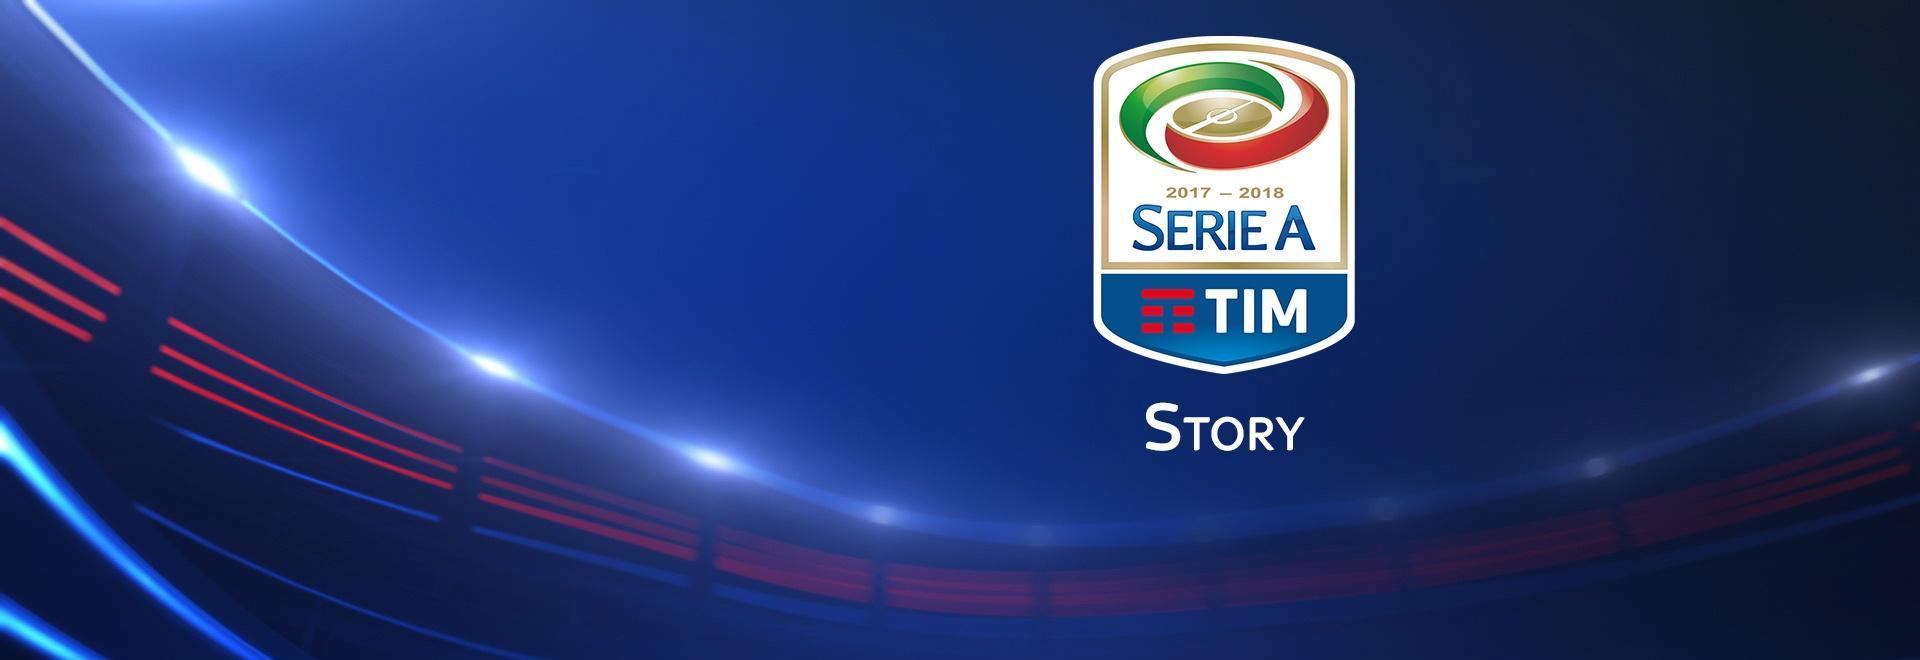 Napoli - Juventus 26/09/15